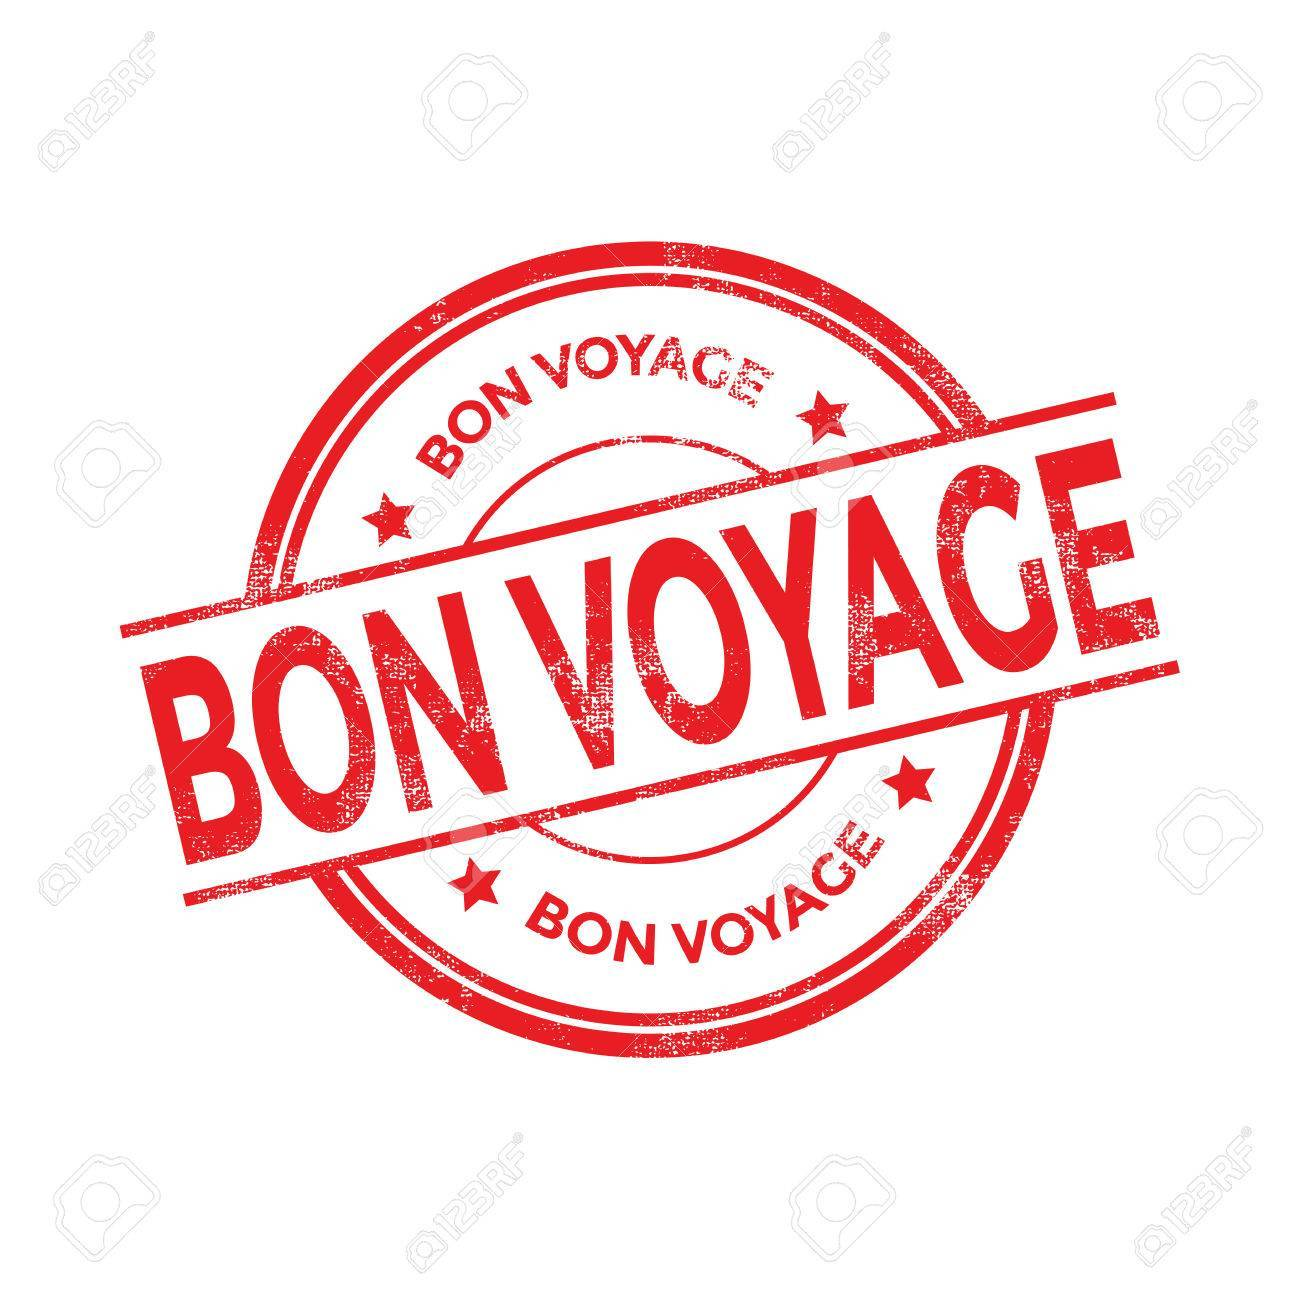 Bon voyage clipart free 8 » Clipart Portal.